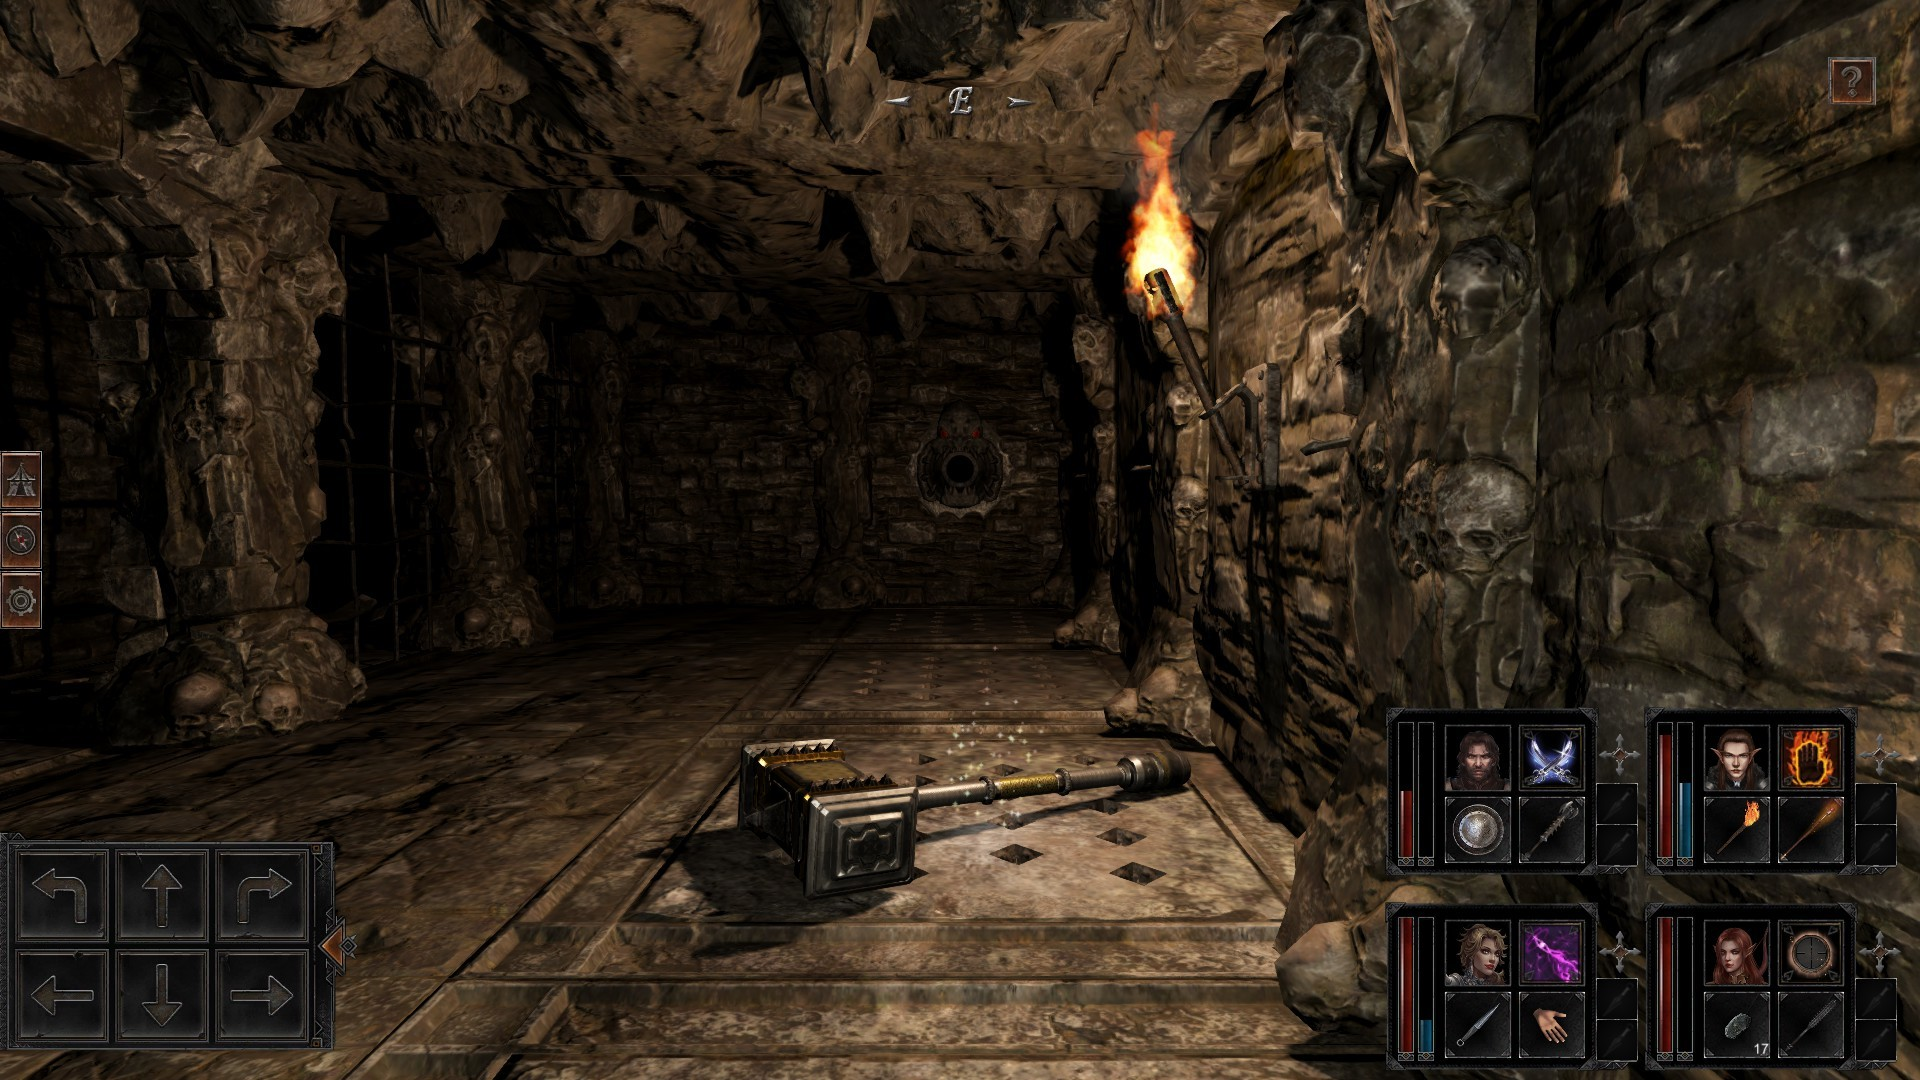 Dungeon Of Dragon Knight screenshot